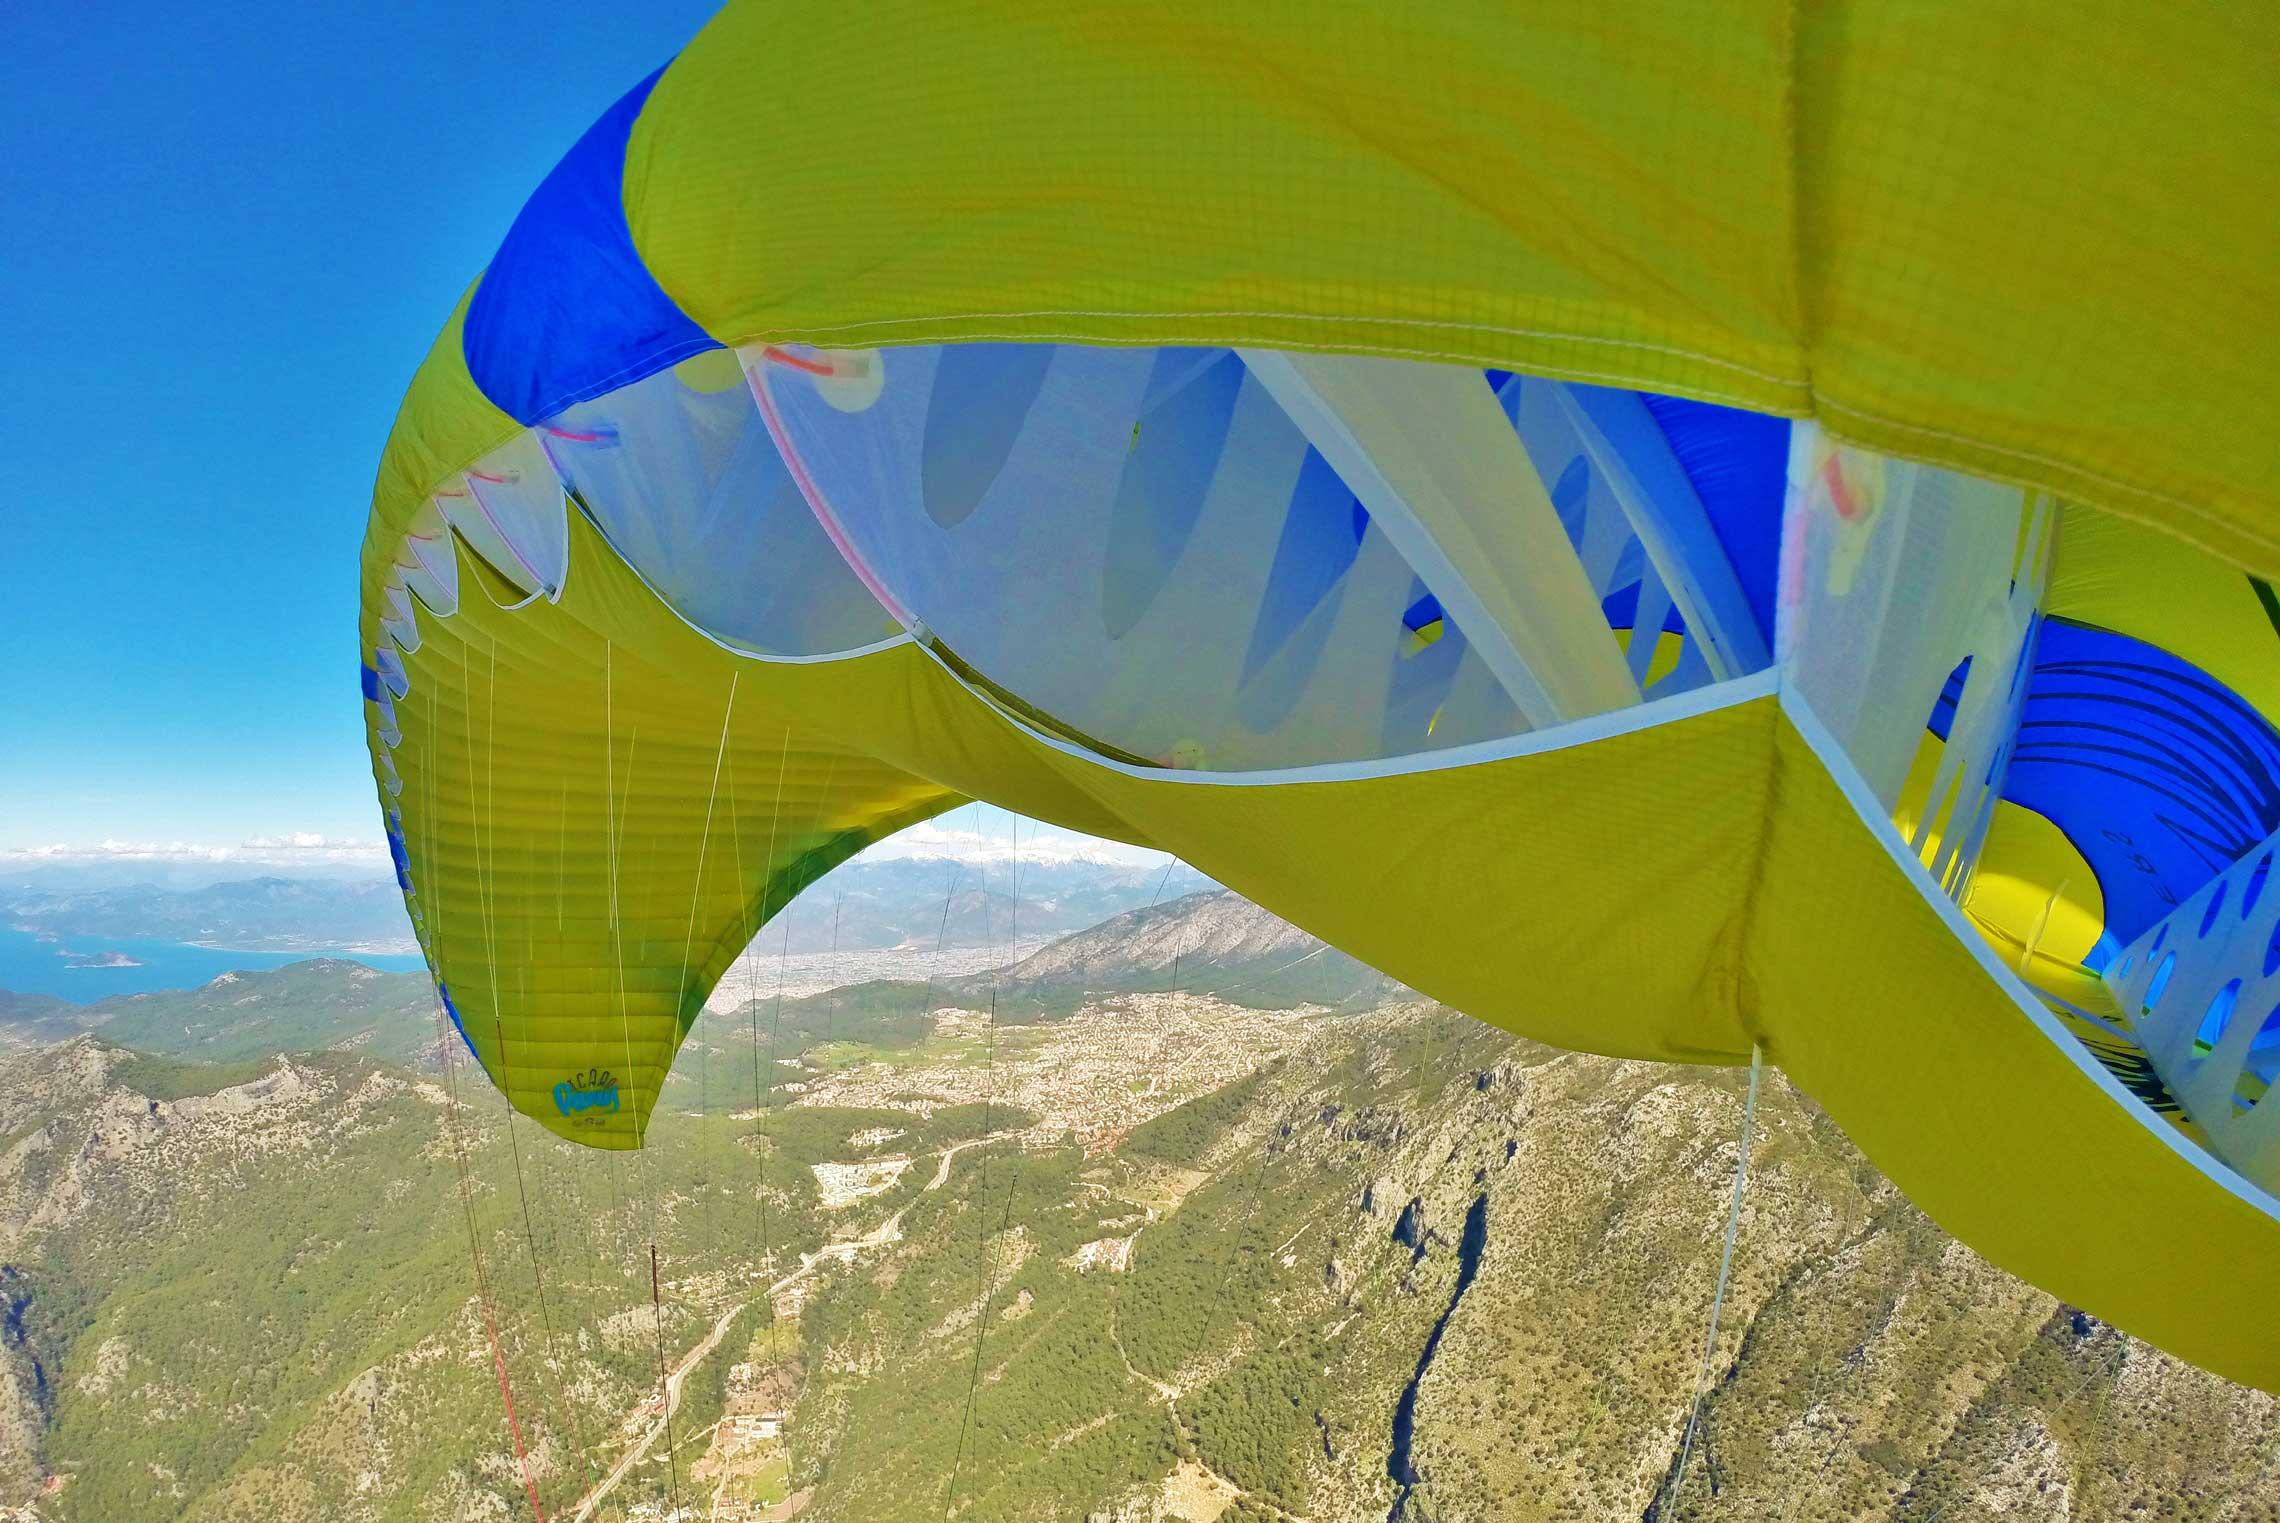 icaro-paragliders-parus-gallery_14